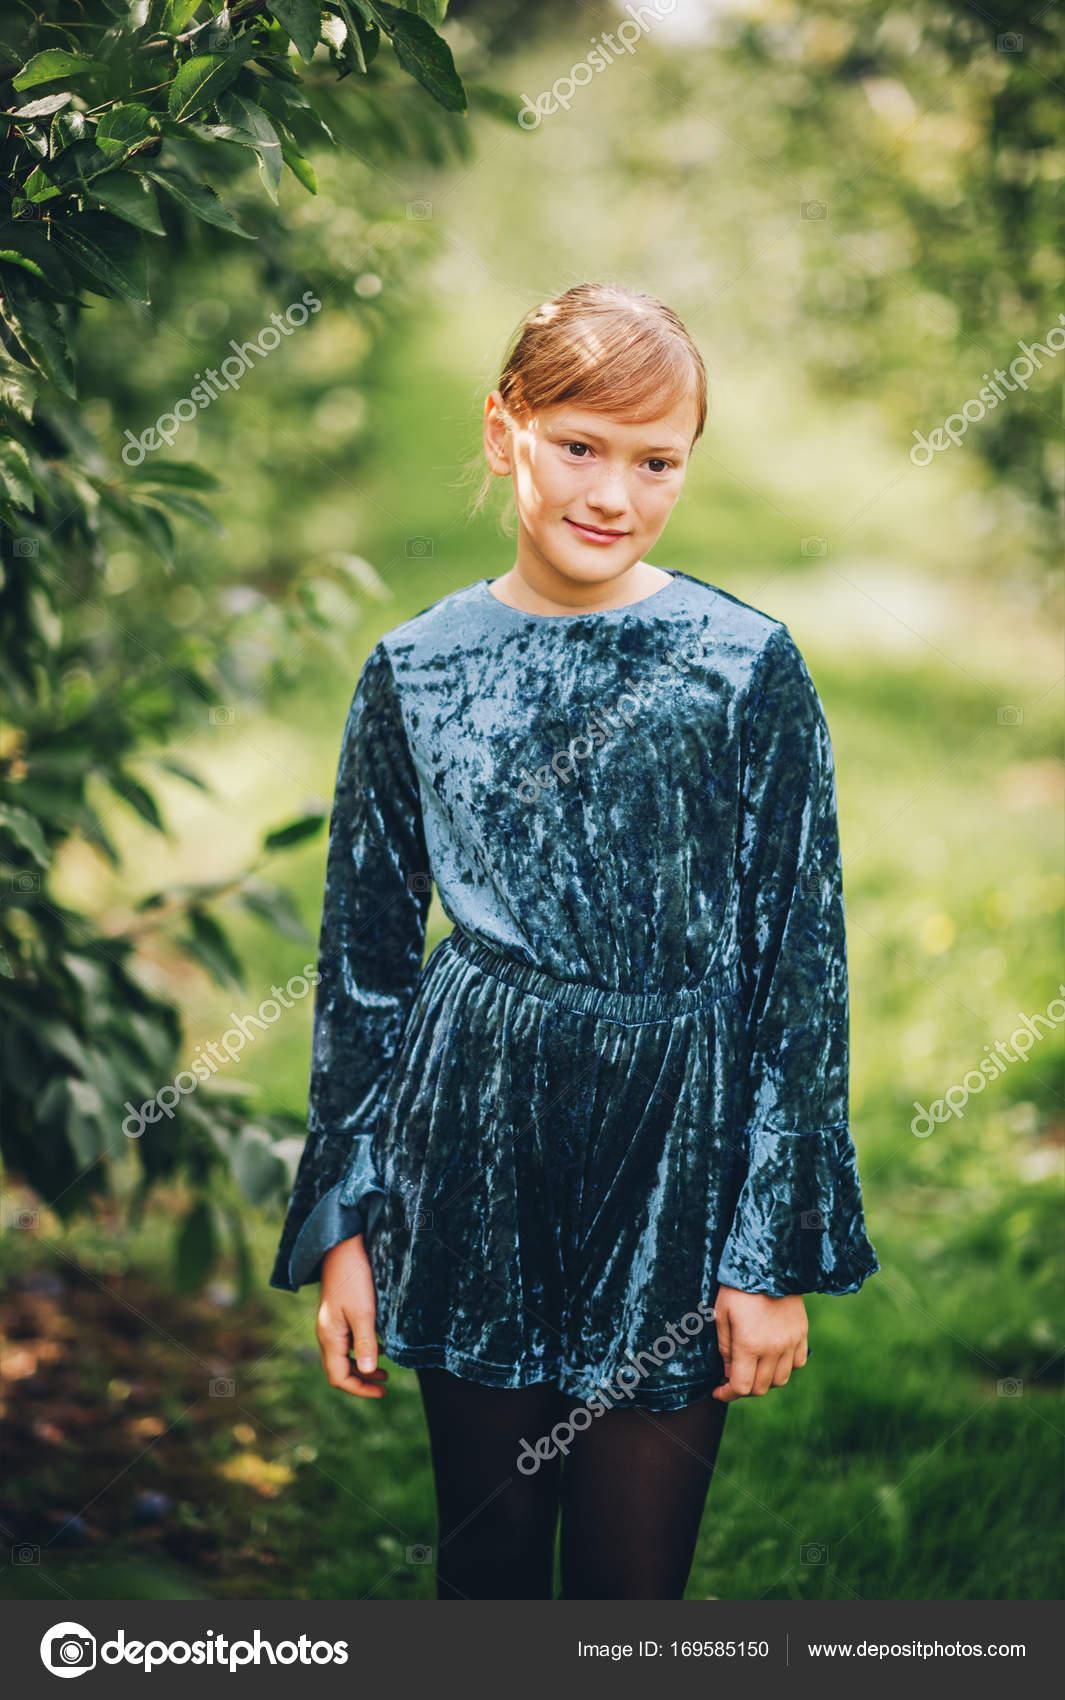 576fd36f8a8 Εξωτερική πορτρέτο του όμορφο κοριτσάκι 10 χρονών φορώντας Ολόσωμο σορτς  μπλε βελούδο– εικόνα αρχείου